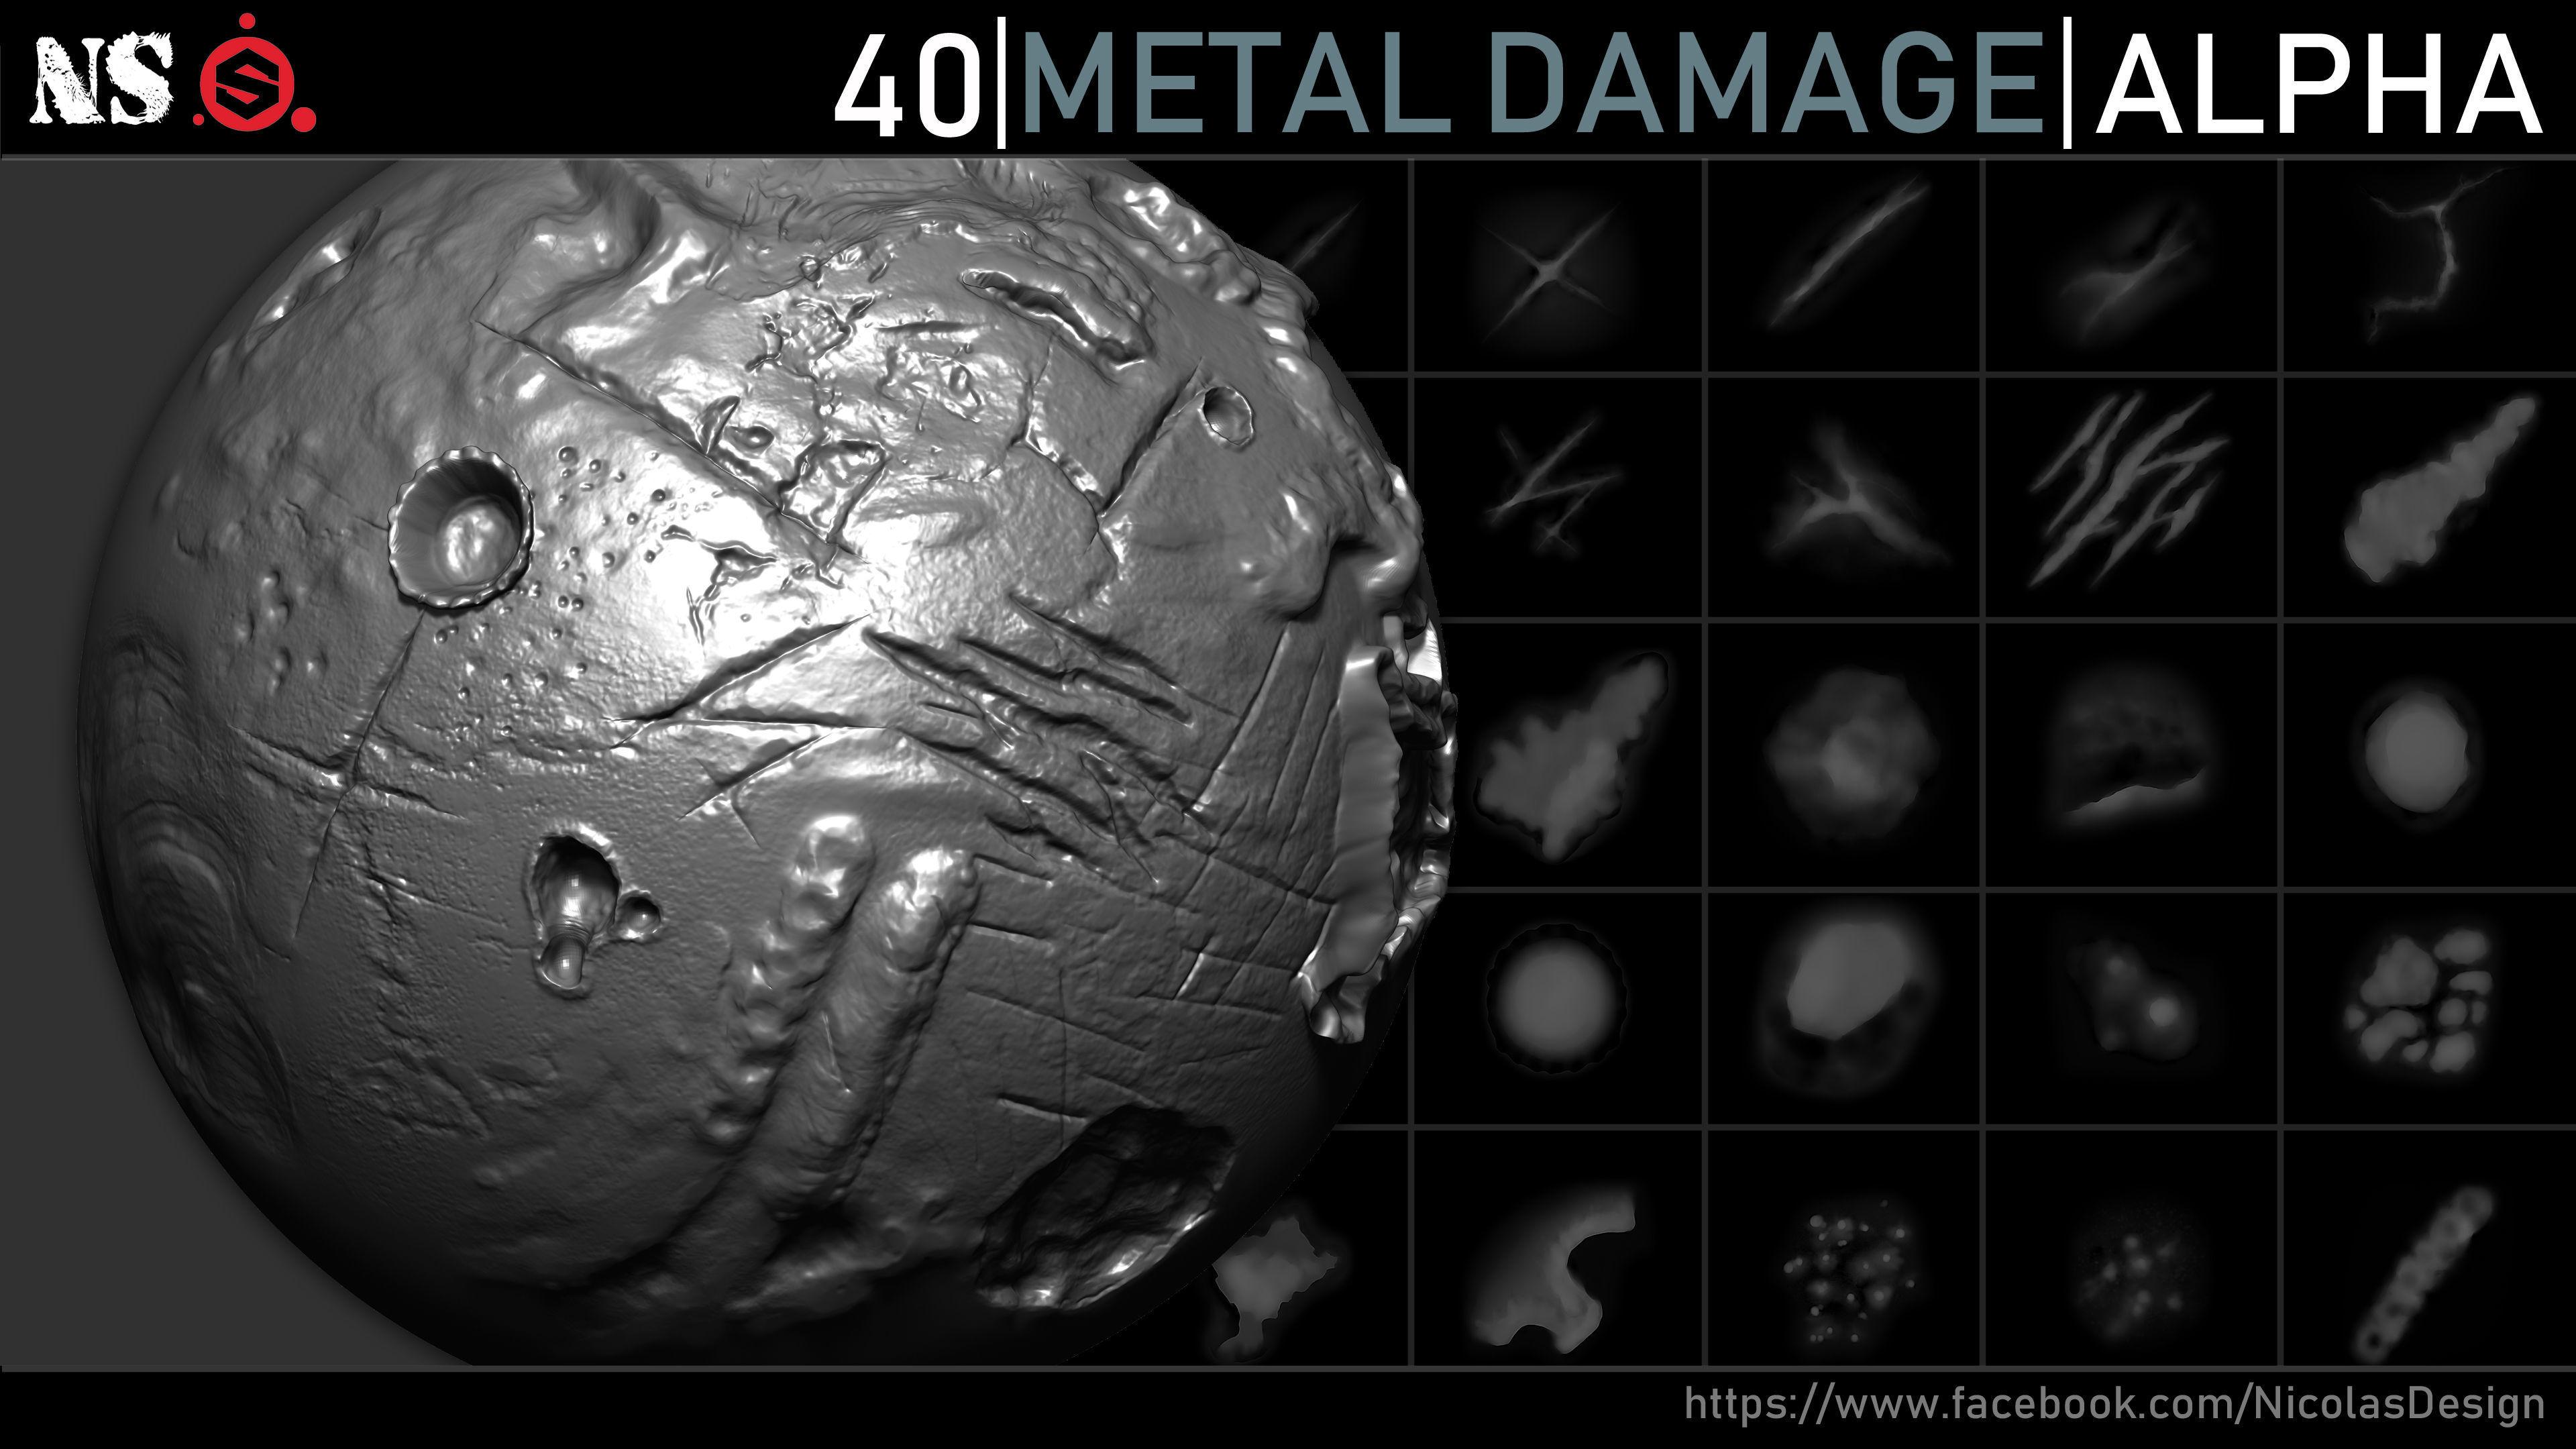 Metal Damage Alphas